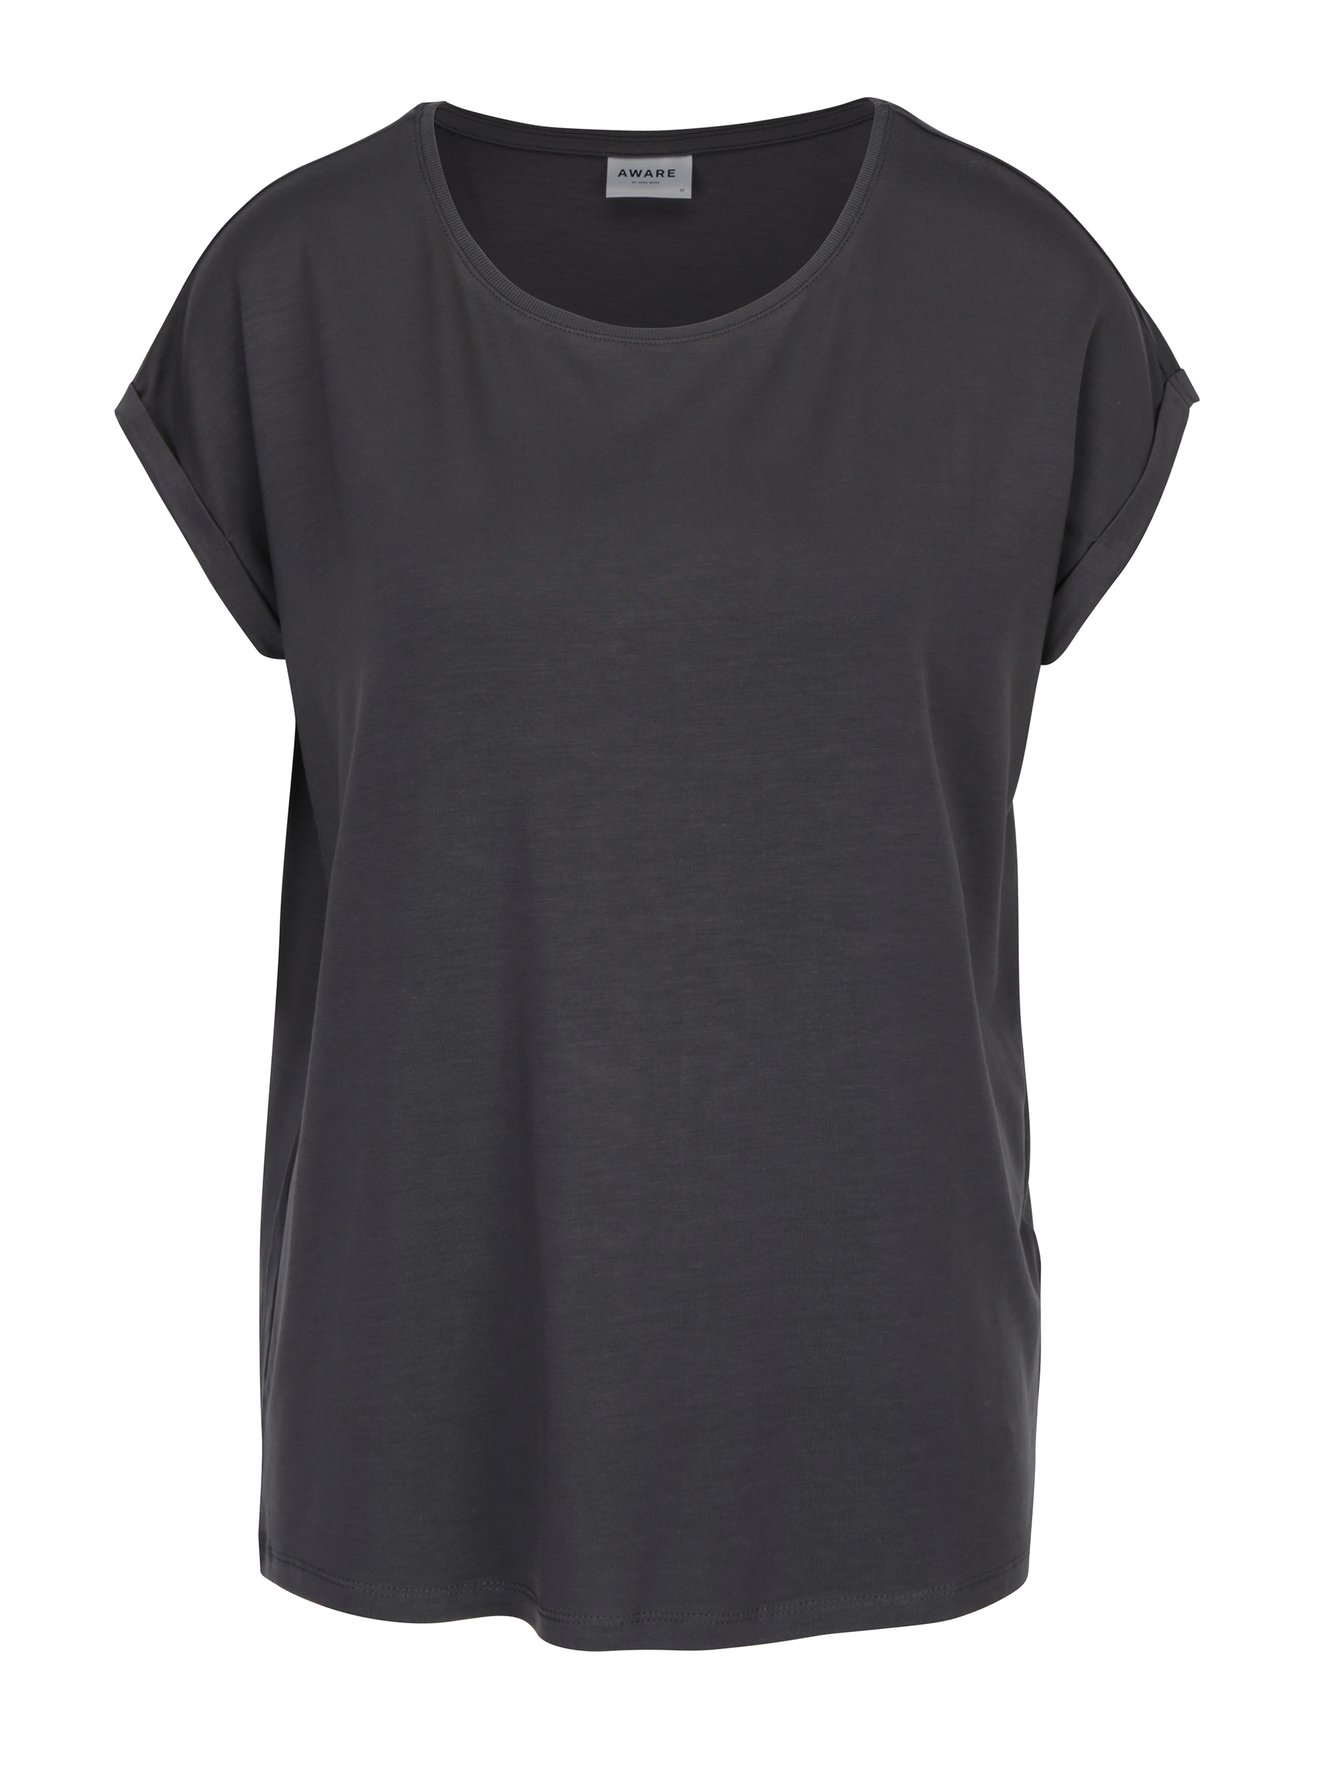 03d9b3161556 Šedé basic tričko s krátkým rukávem VERO MODA AWARE Ava